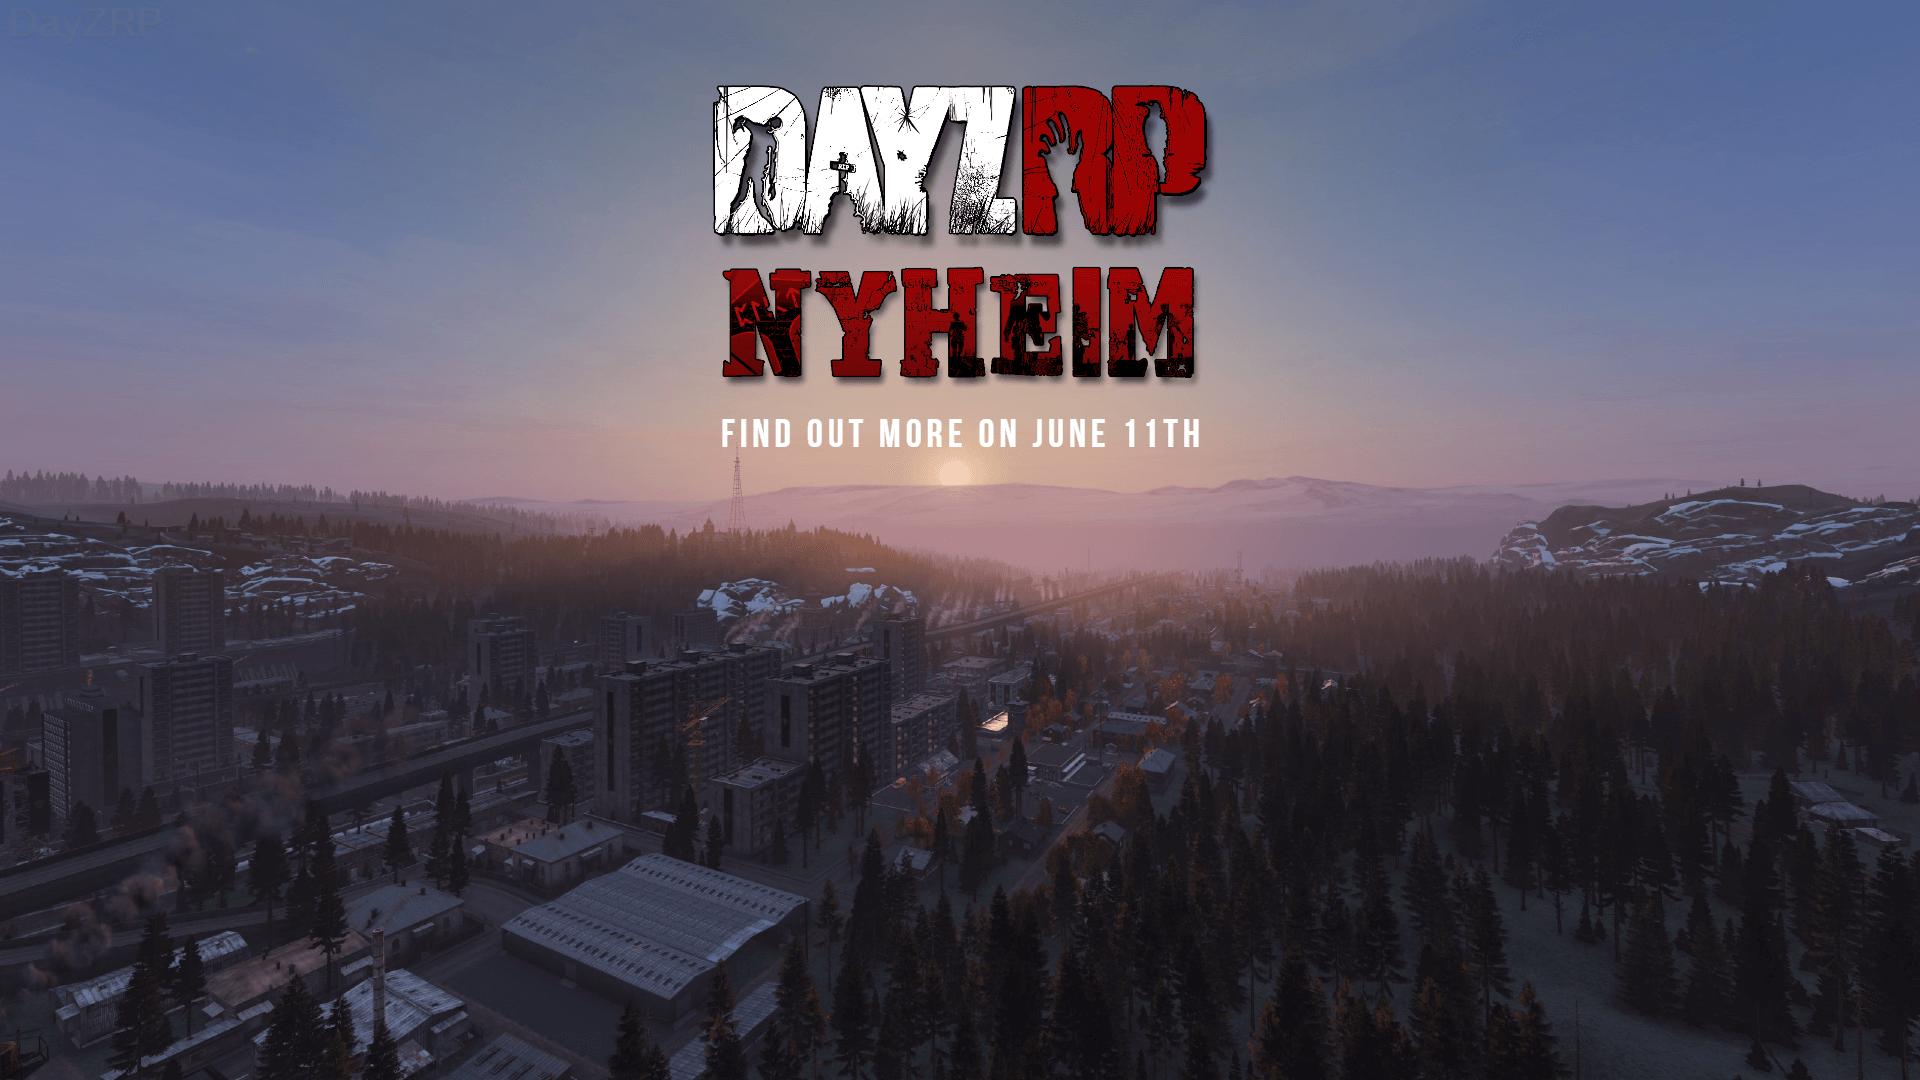 DayZRP Nyheim reveal